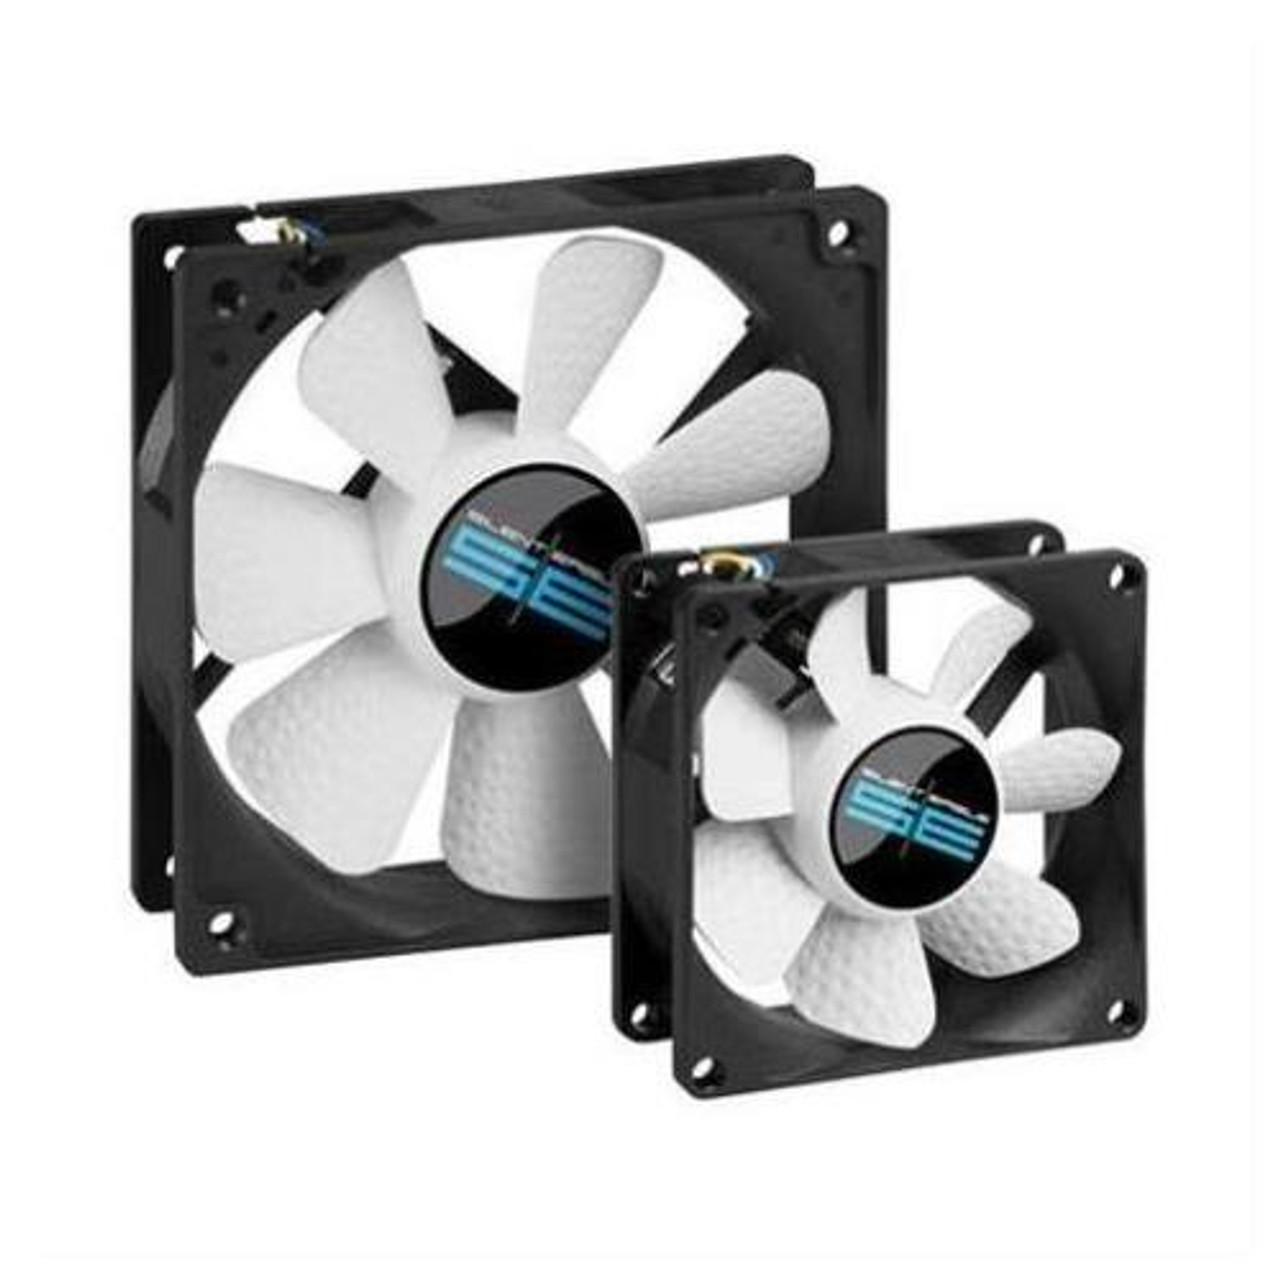 Cisco UCSC-HS-C240M3 CPU Processor Heat Sink for UCS C240 M3 Rack Server